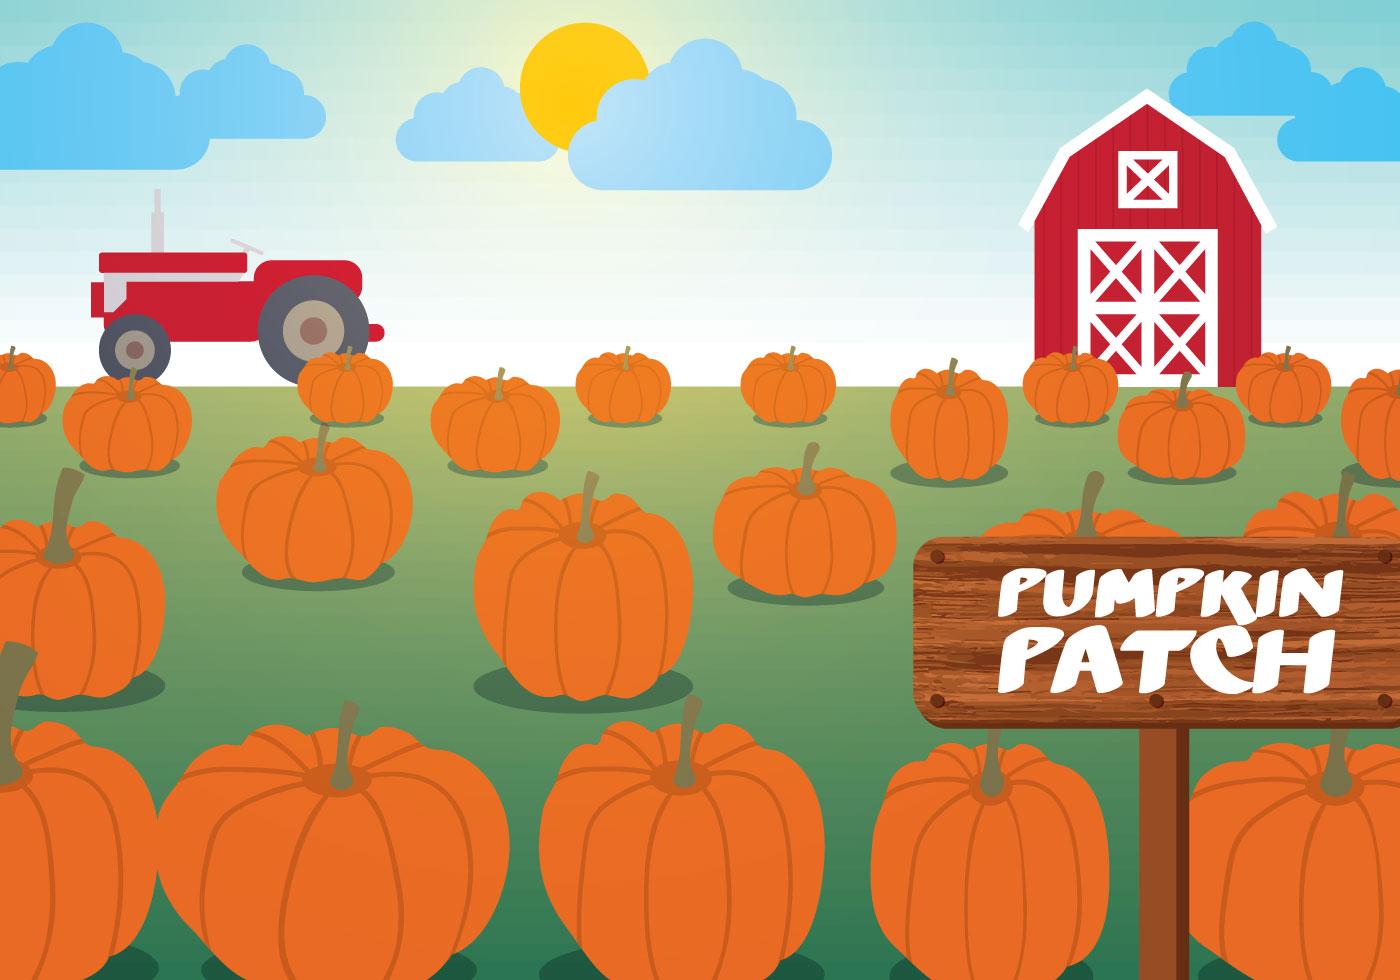 pumpkin patch vector download free vector art  stock clip art eyes looking through binocular clip art eyes halloween